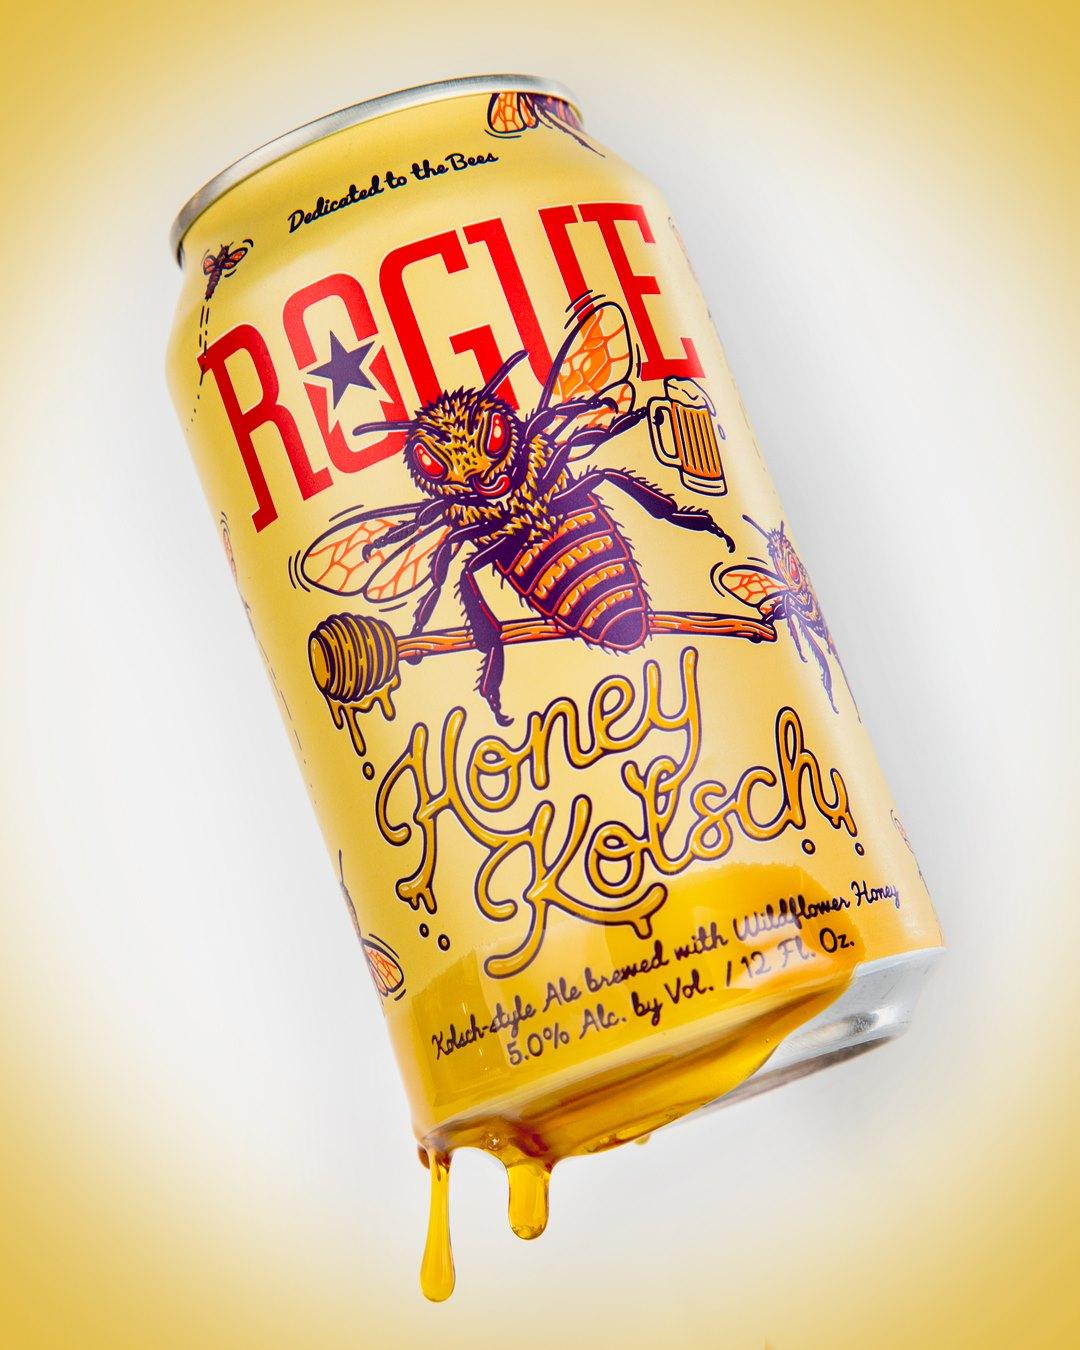 image of Honey Kolsch courtesy of Rogue Ales & Spirits